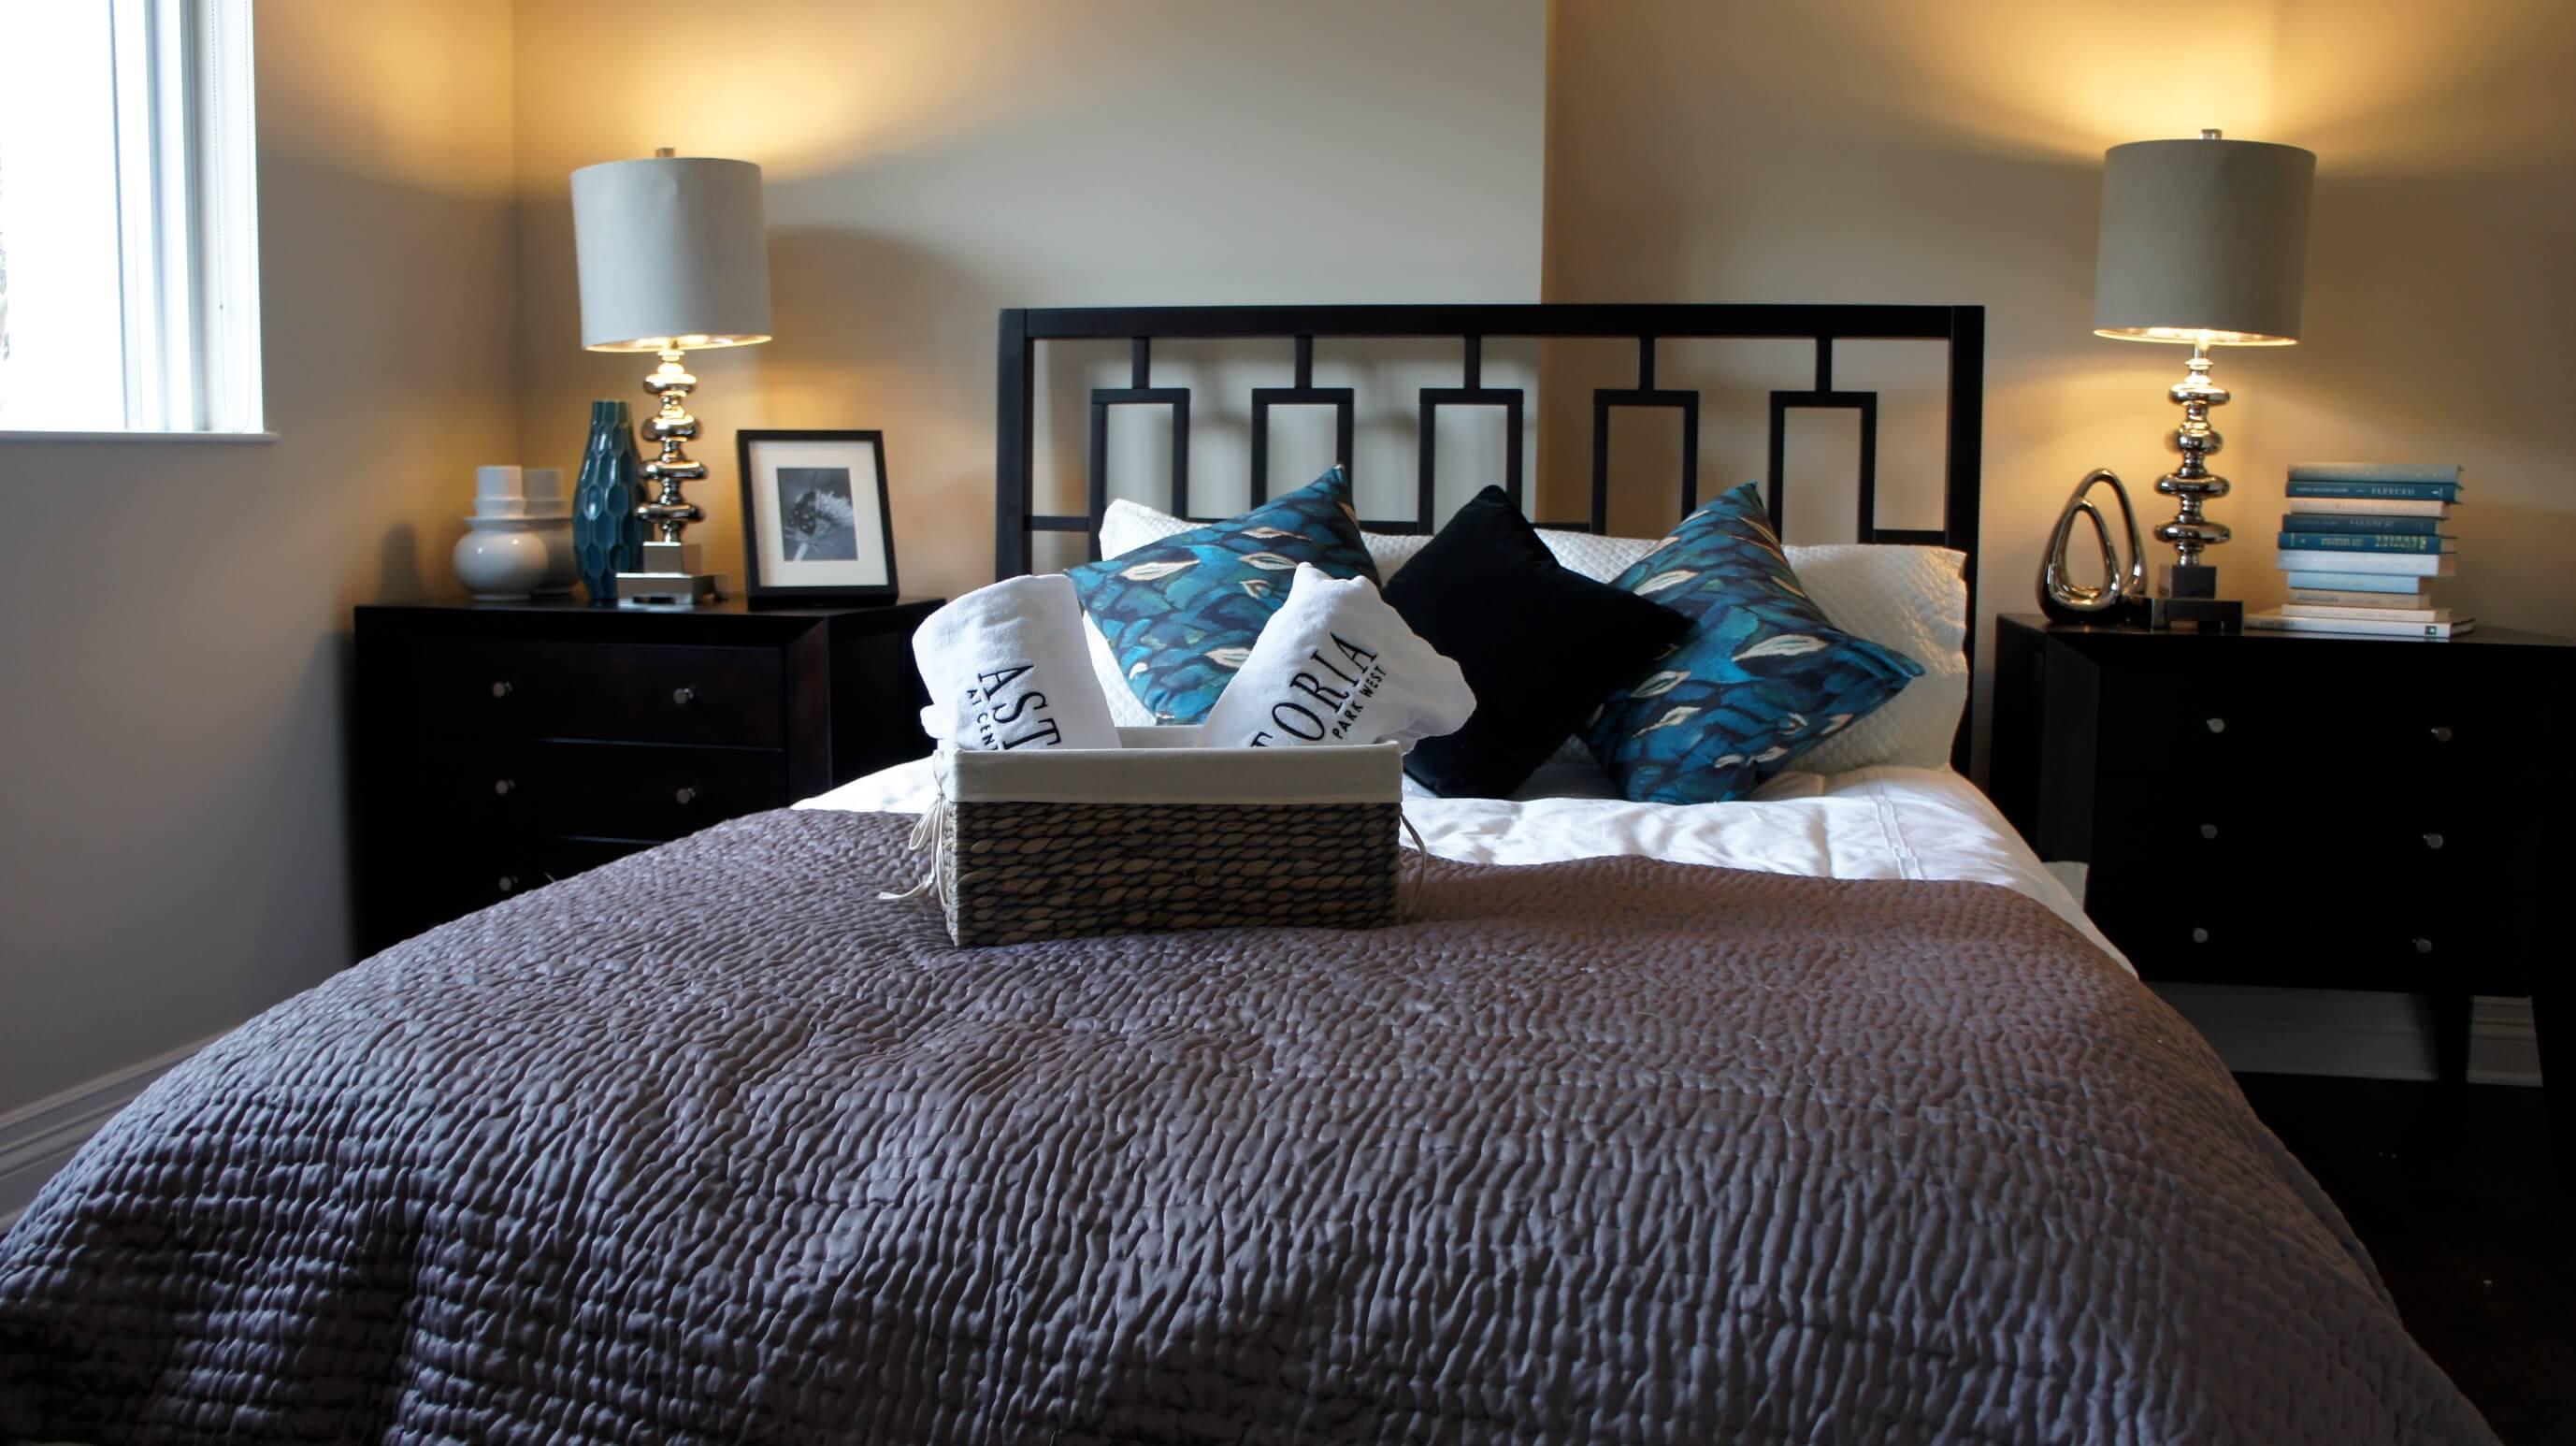 astoria-at-central-park-west-x-nubry-luxury-apartments-irvine-california-9